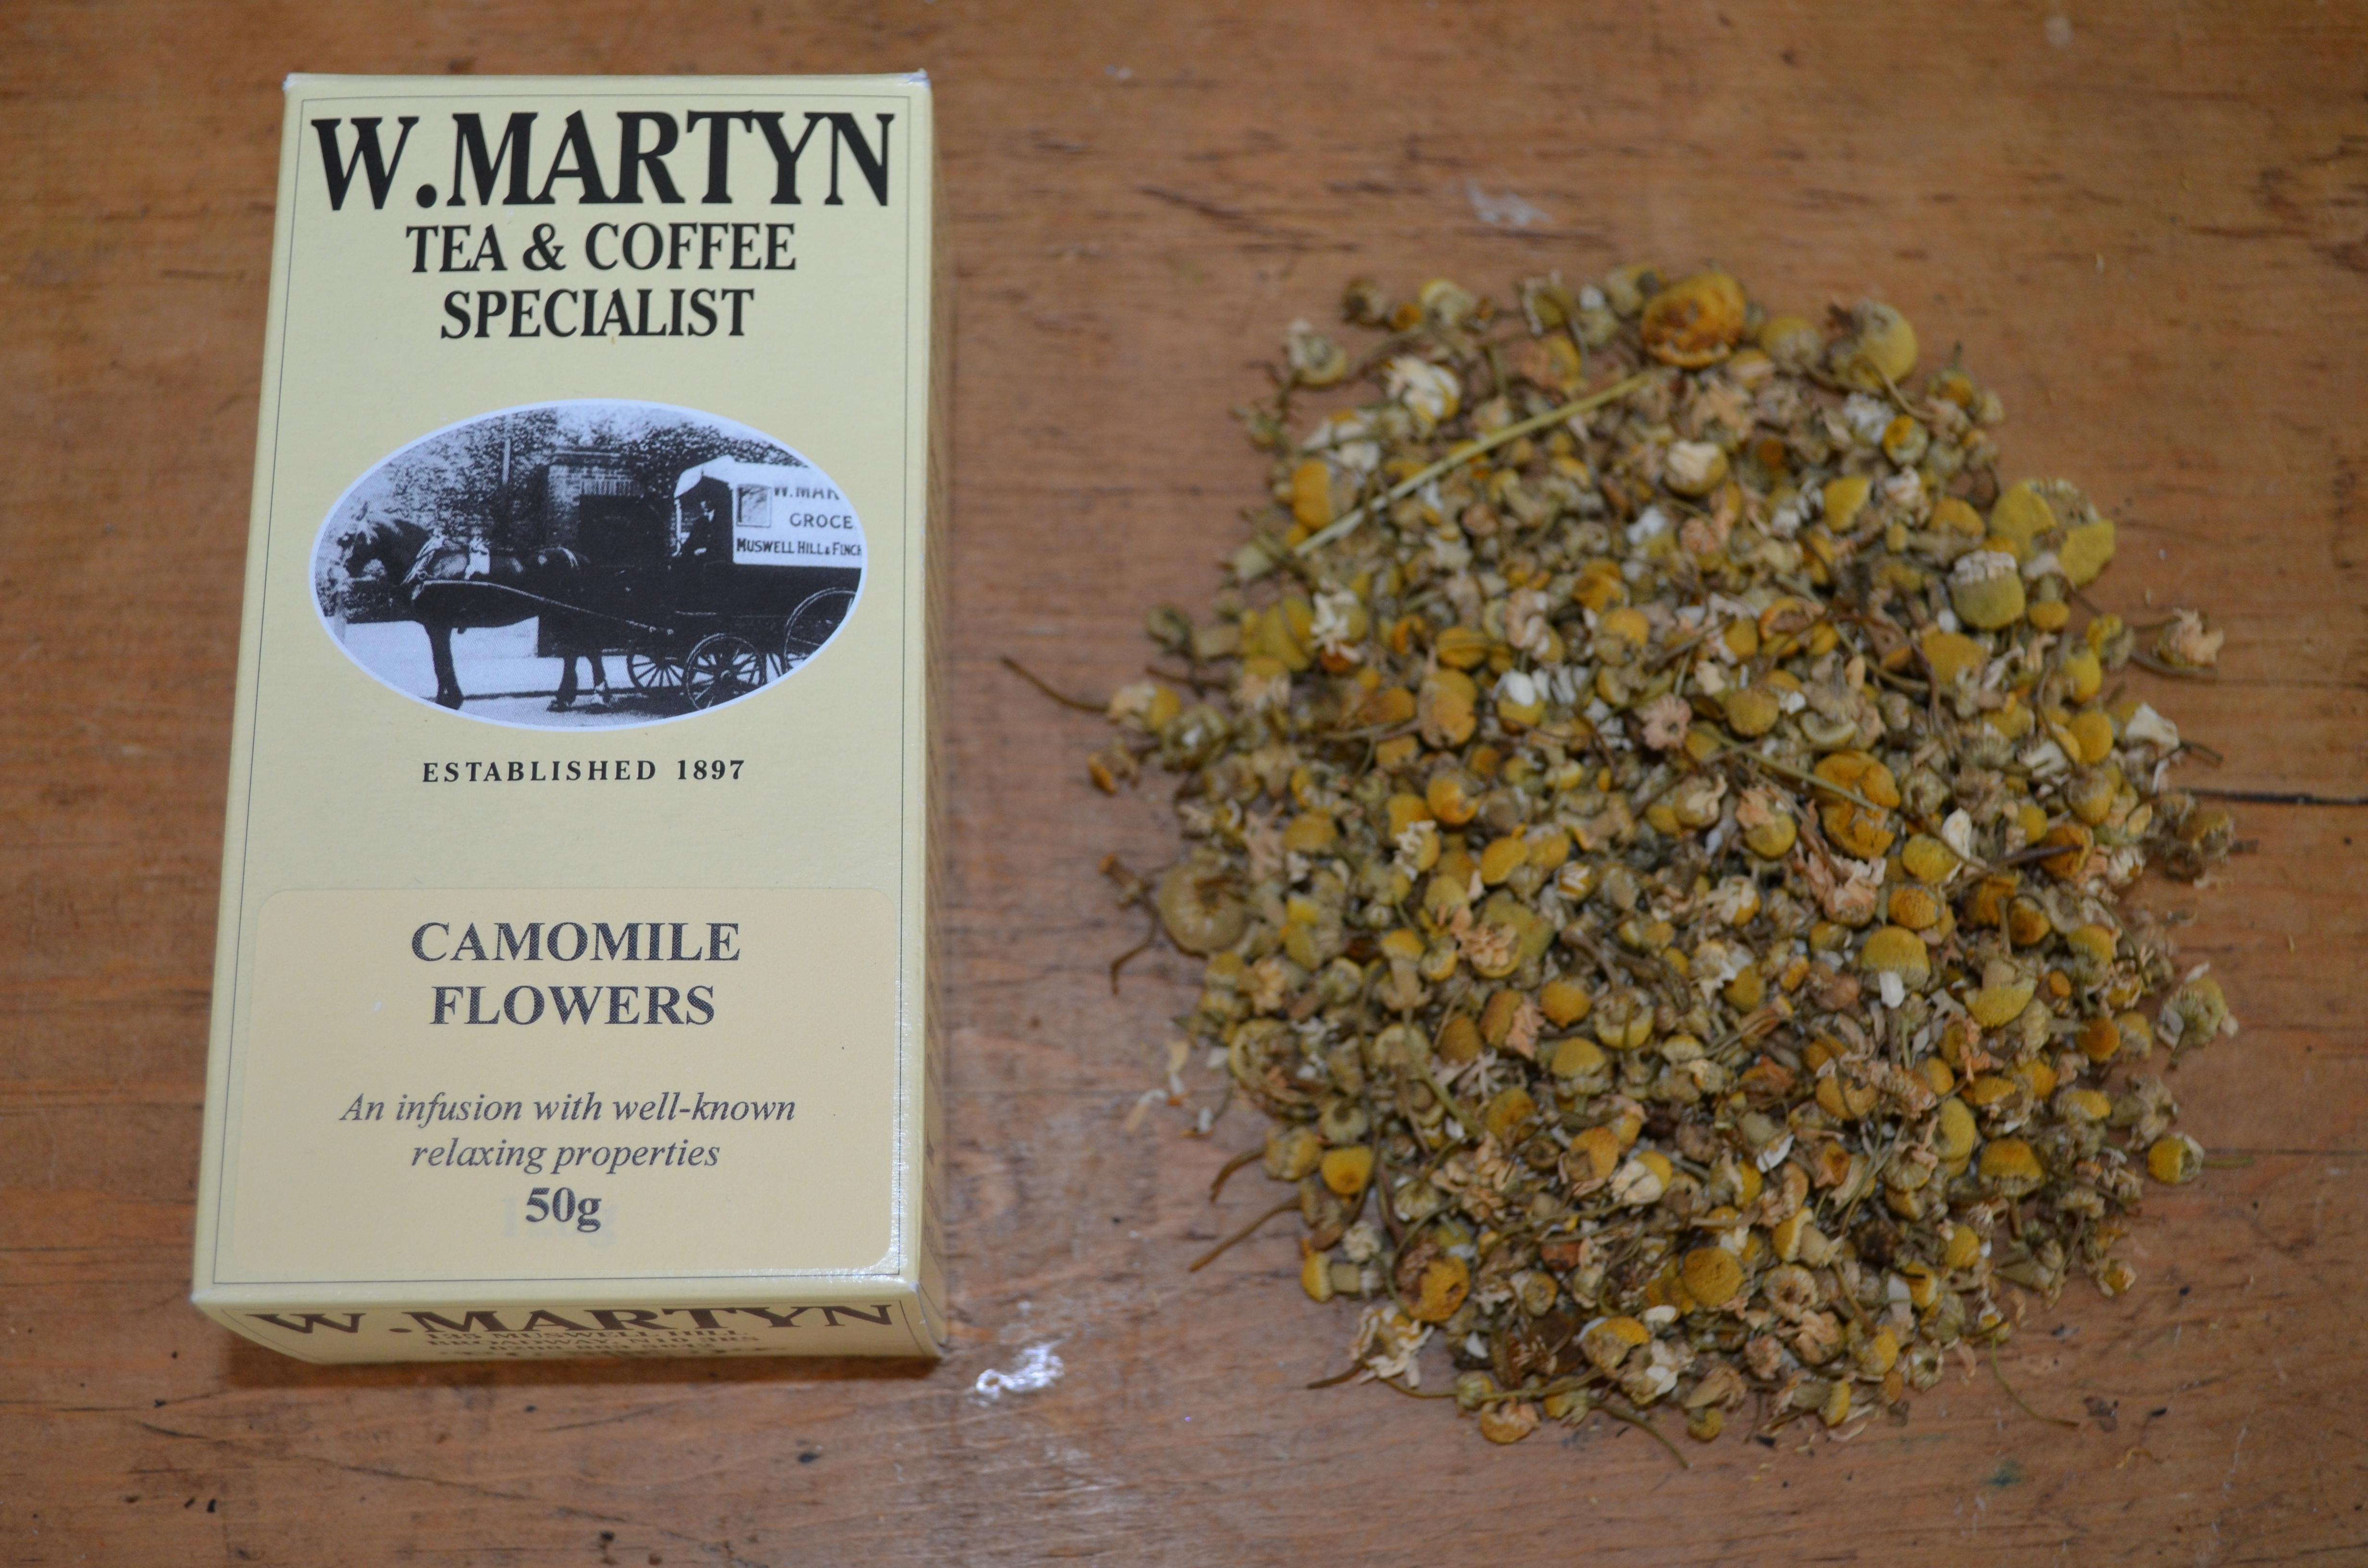 WMartyn Camomile Flowers Tea